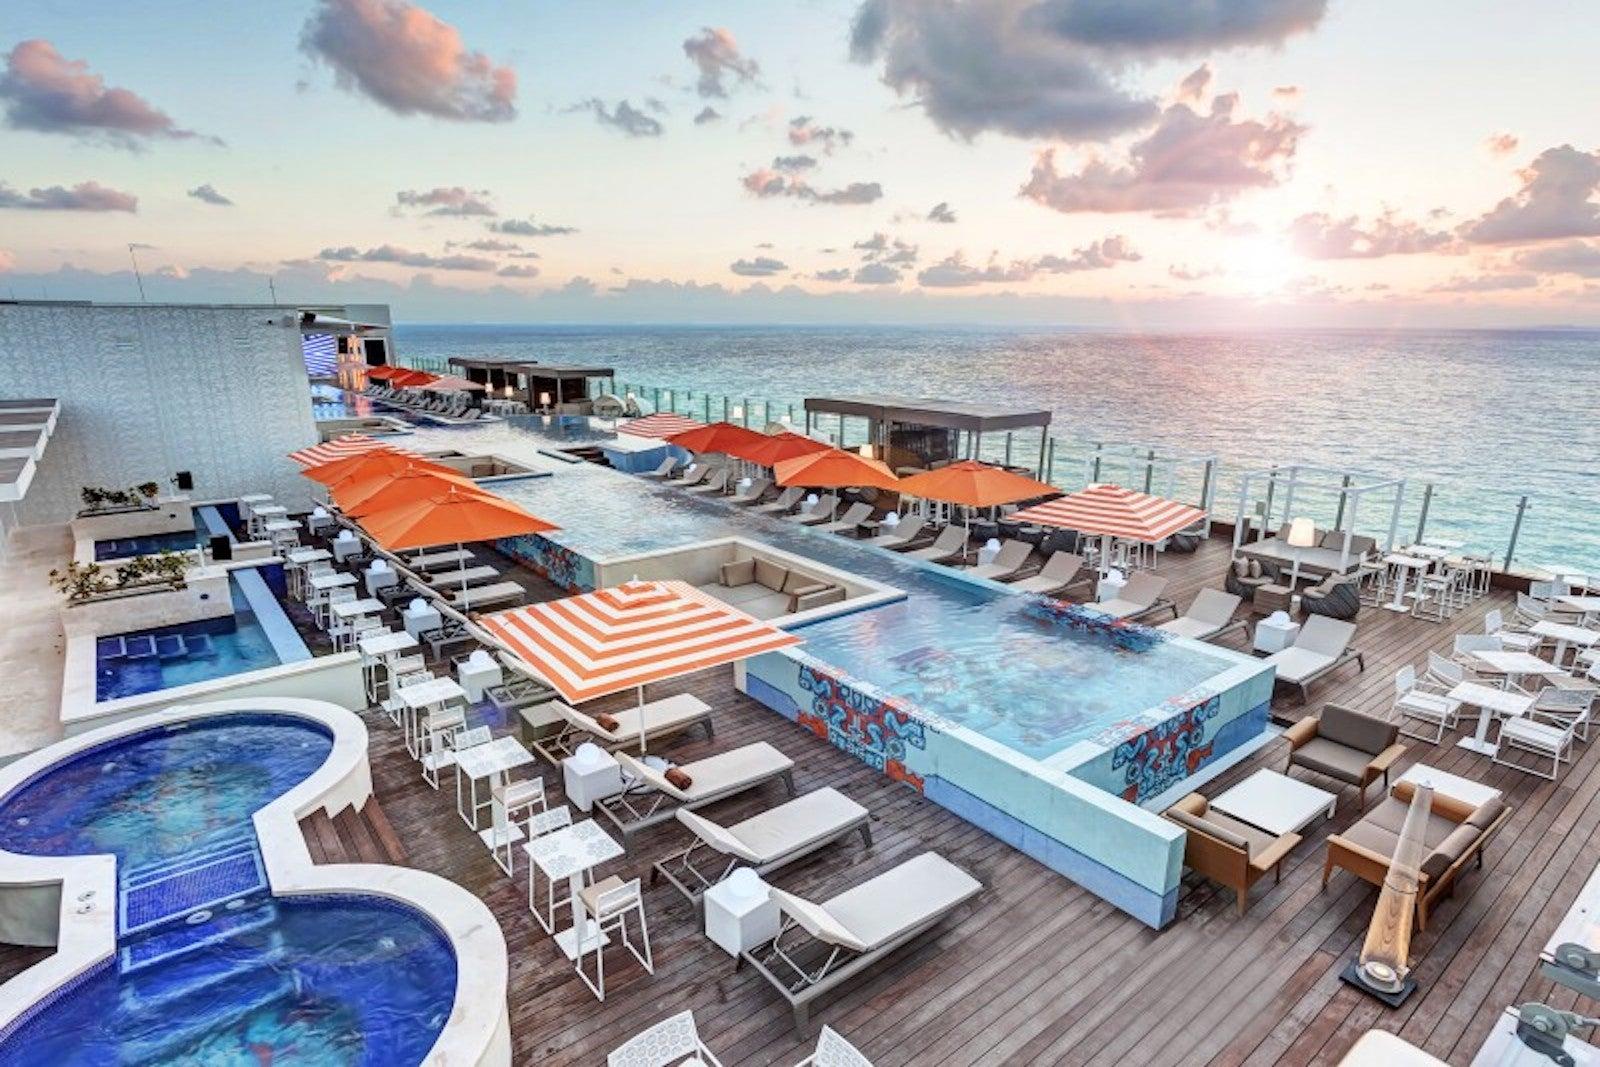 Marriott to add 19 all-inclusive resorts to its portfolio